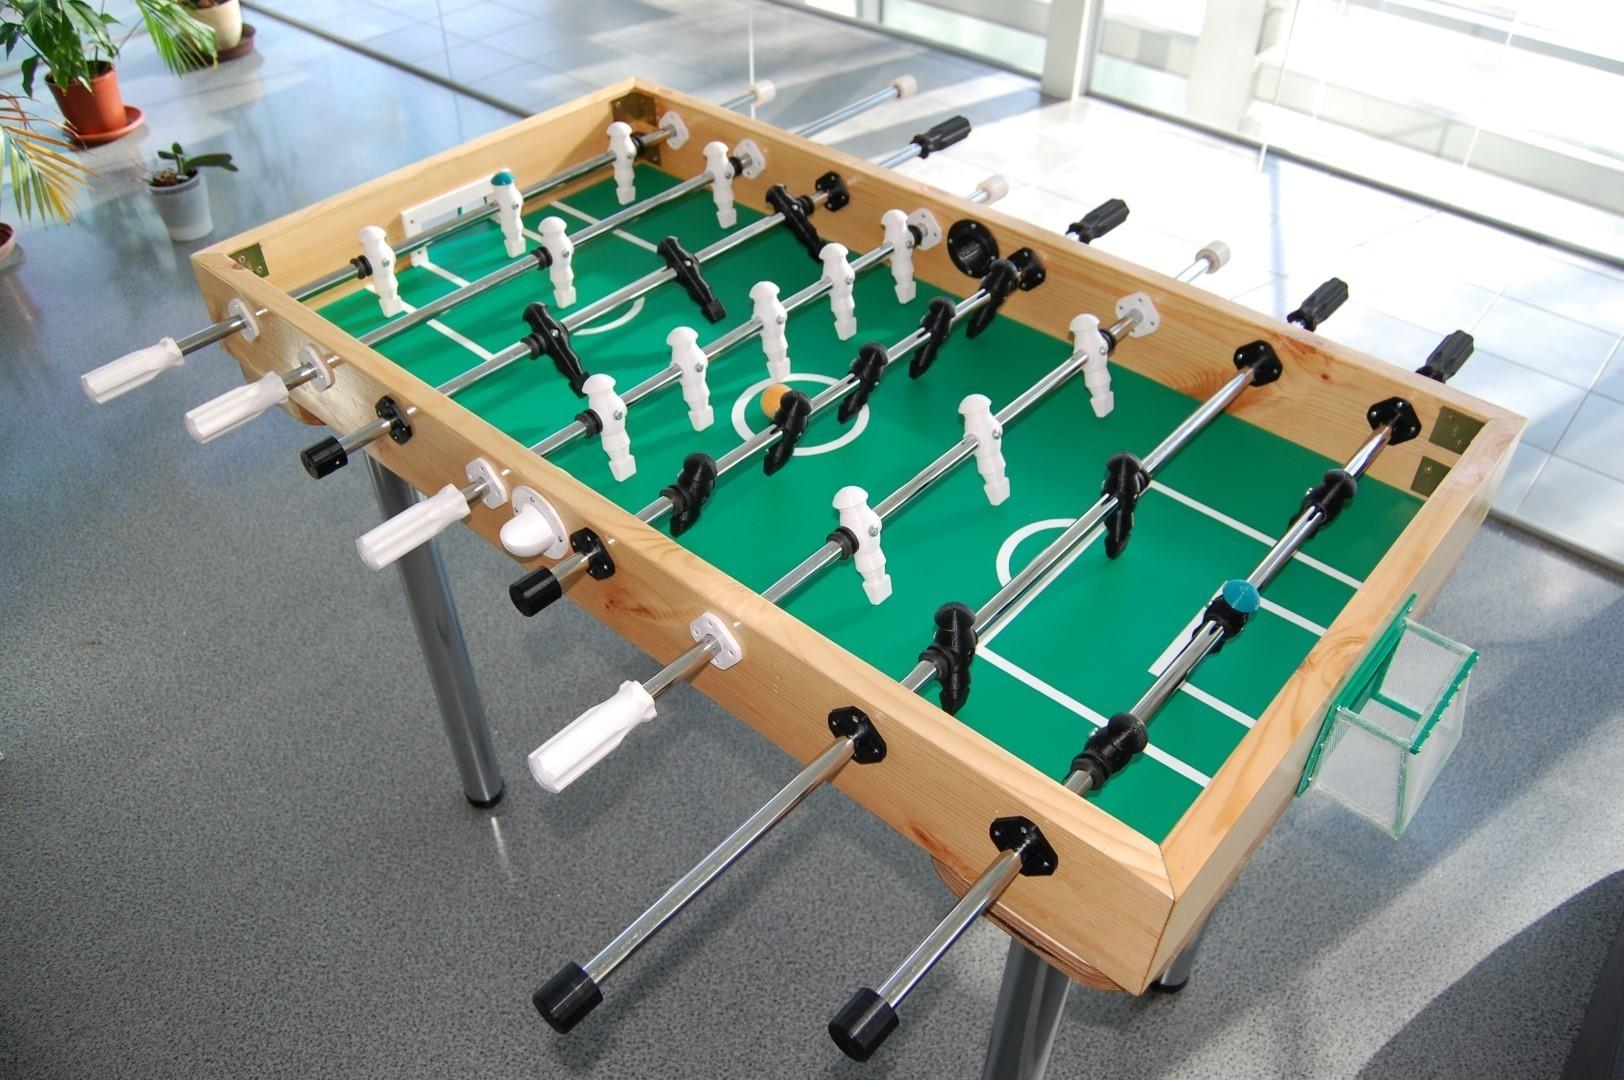 F29Z6CYJ95T8JW1.jpg Download free STL file Foosball table accessories • Template to 3D print, RimvydasP